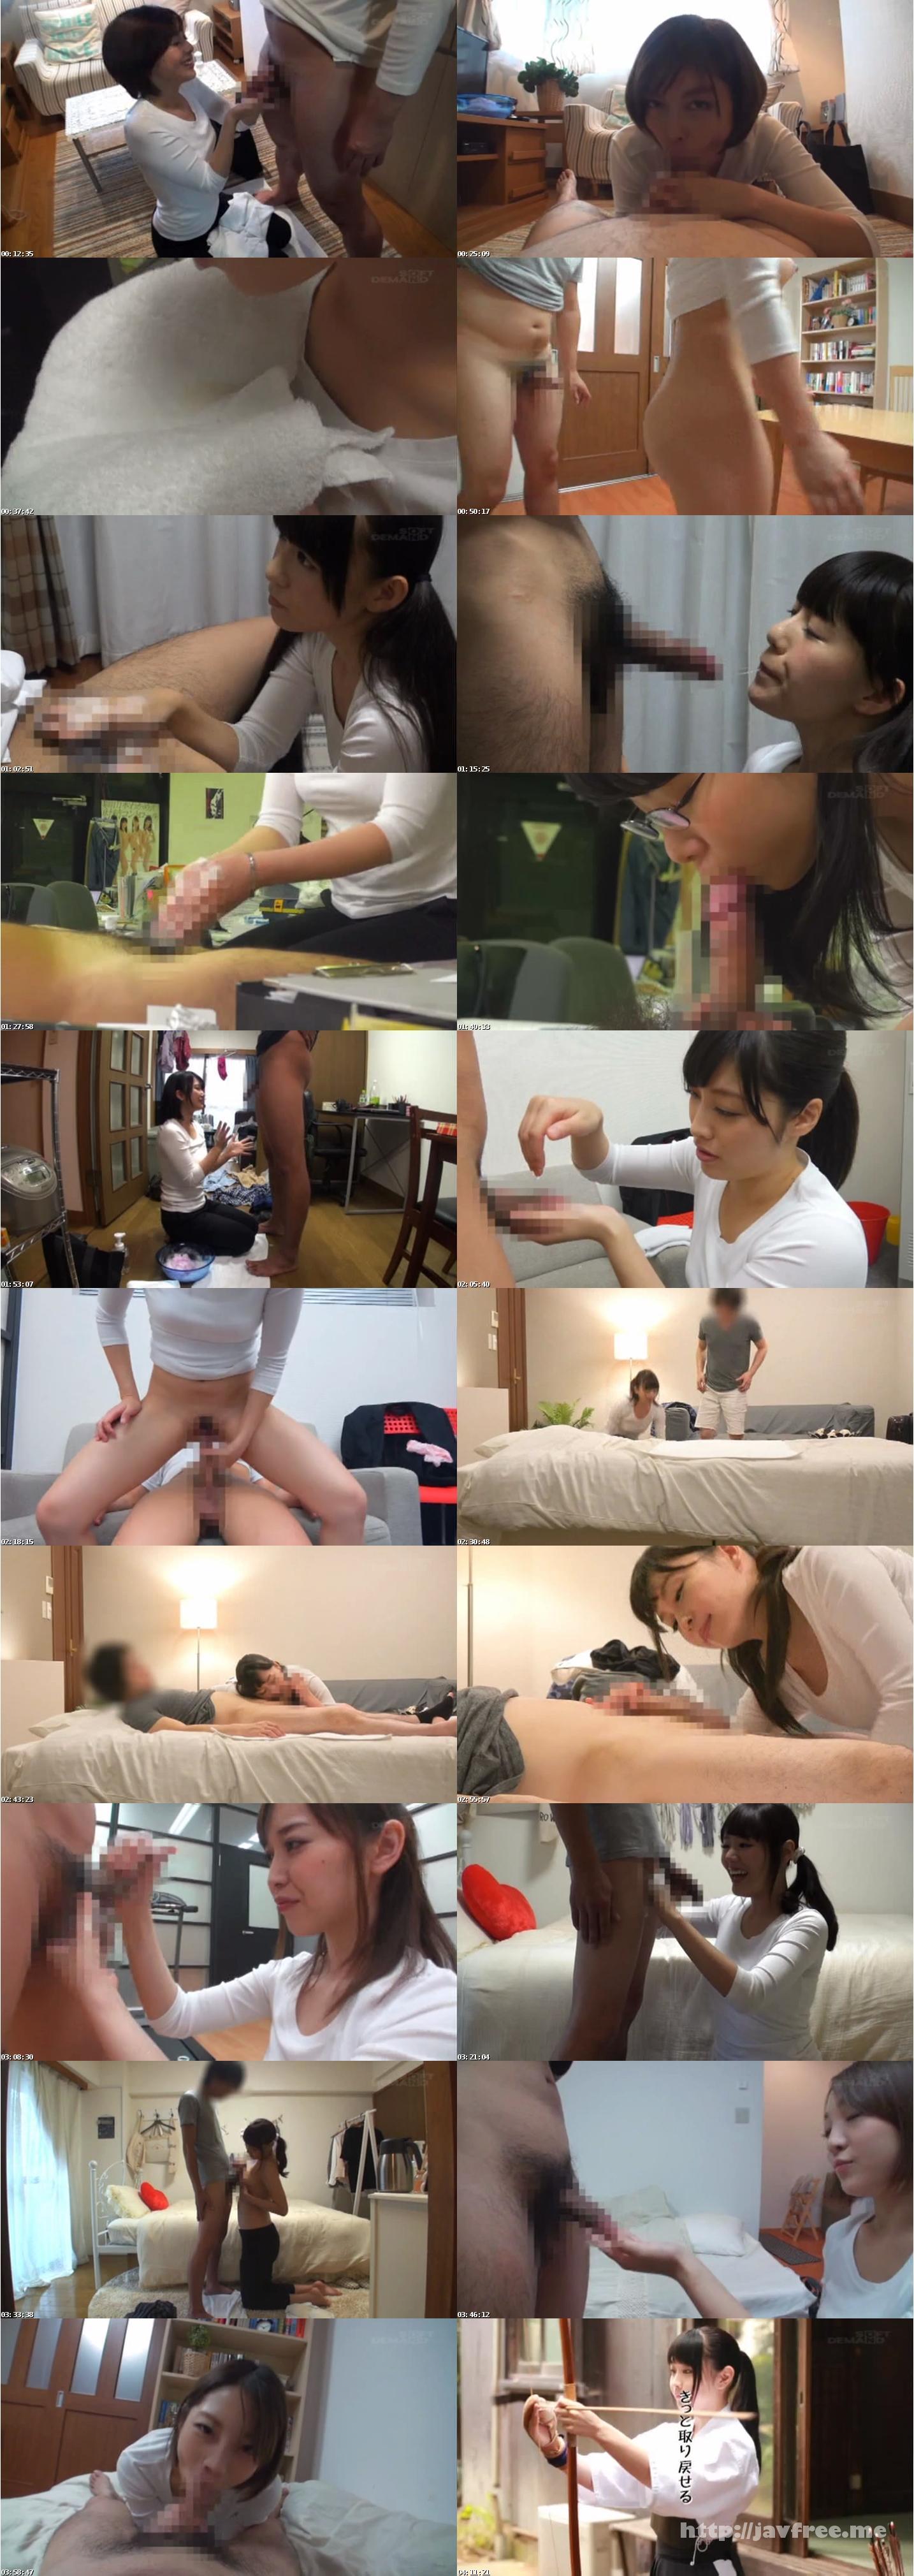 [SDDE 469] ち○ぽ洗い屋のお仕事 15 SDDE